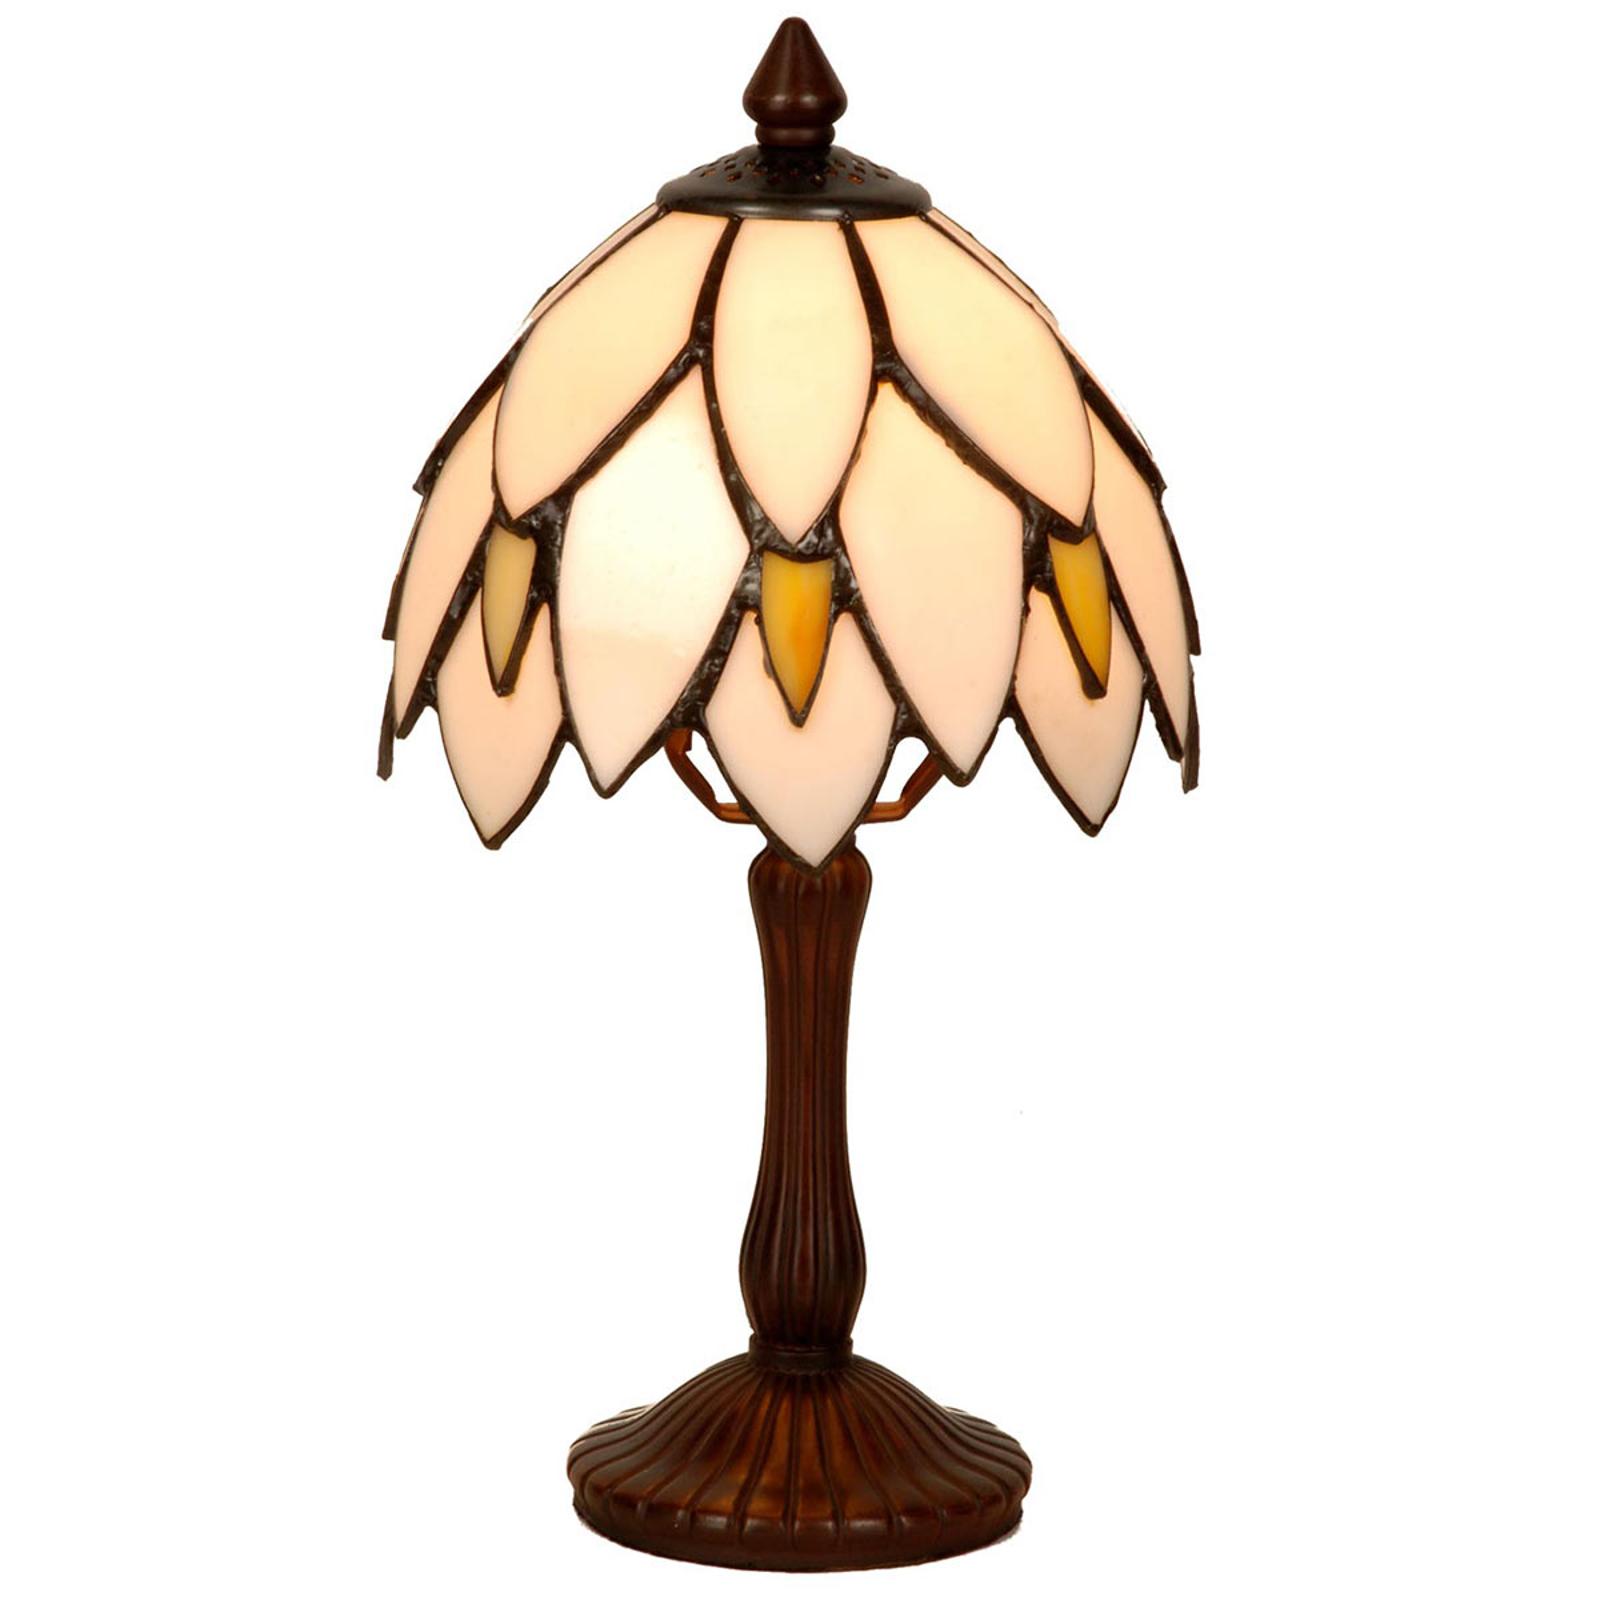 Lampe à poser Lilli style Tiffany